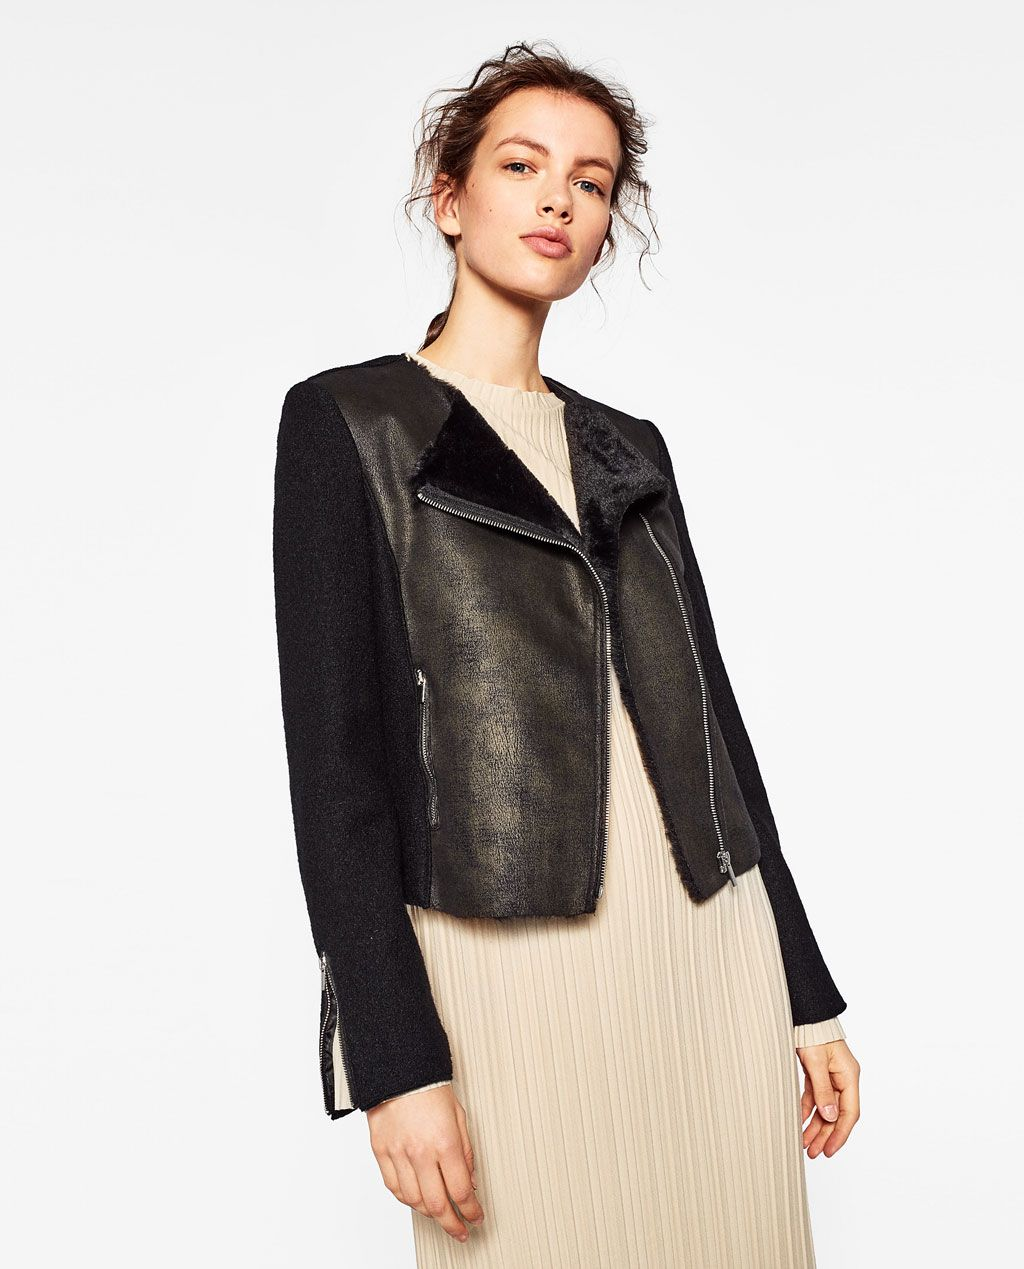 ZARA WOMAN CONTRAST BIKER JACKET Fashion, Zara women